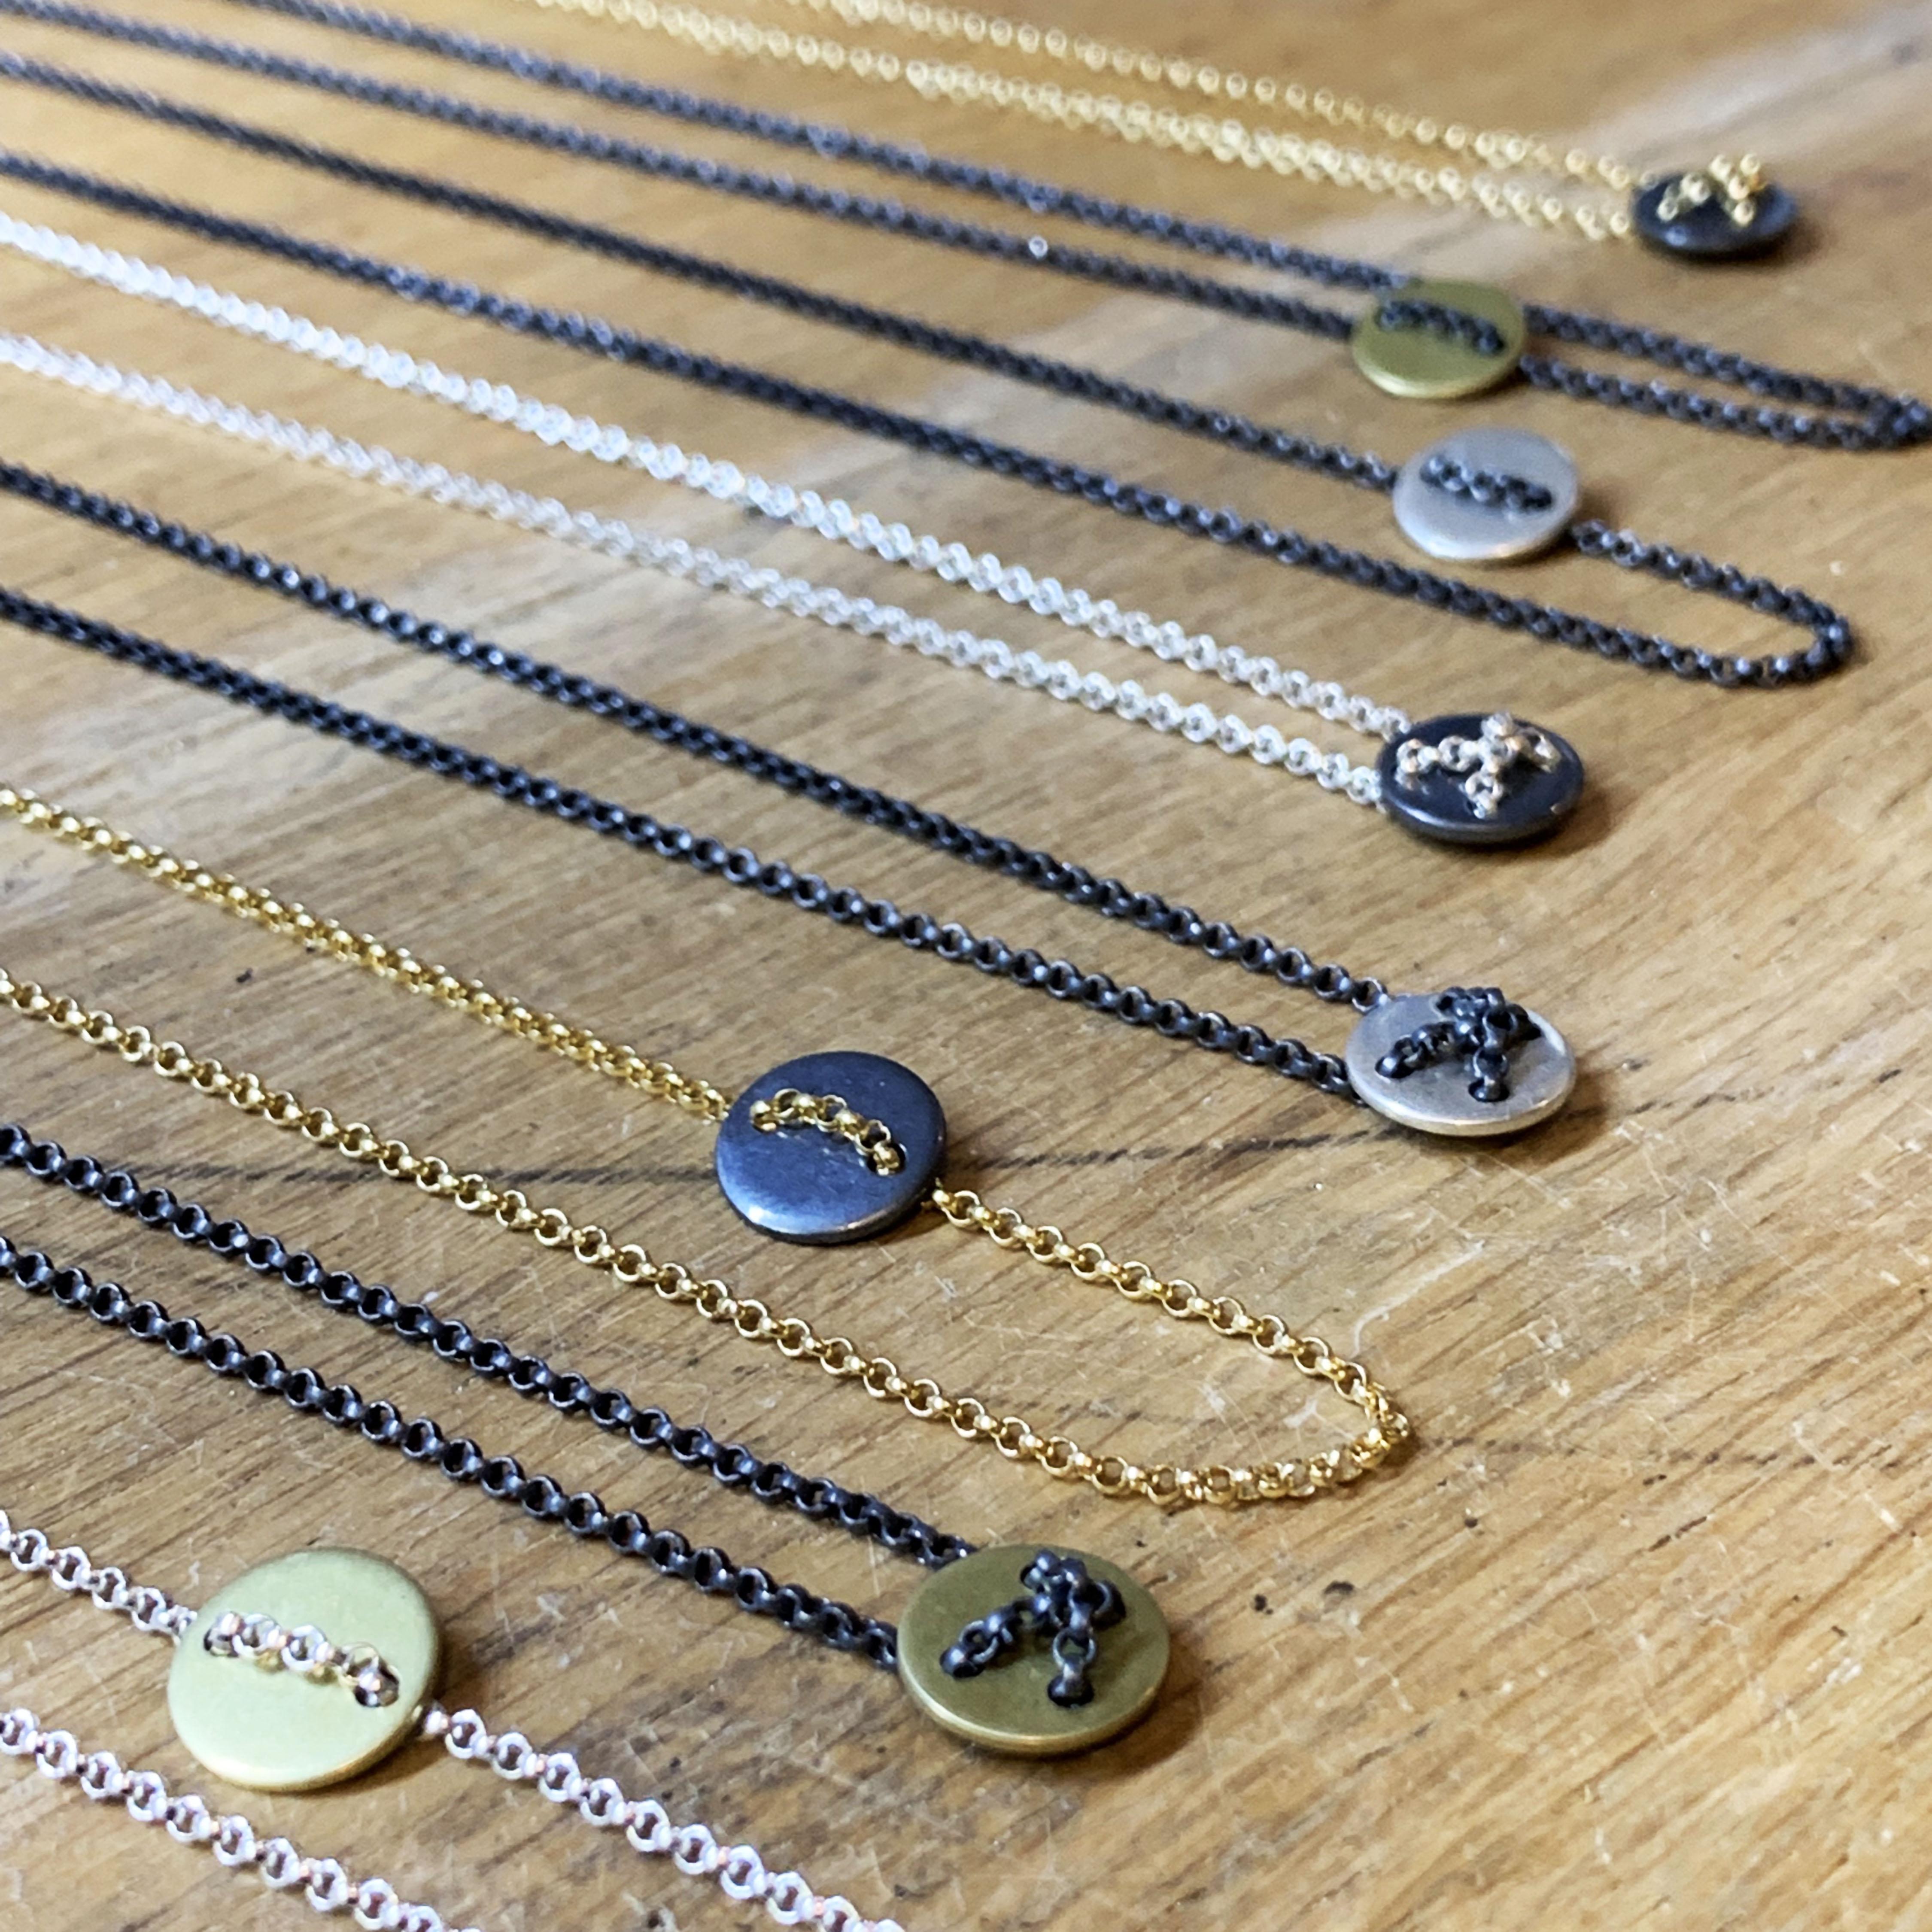 Lifeline silver necklace